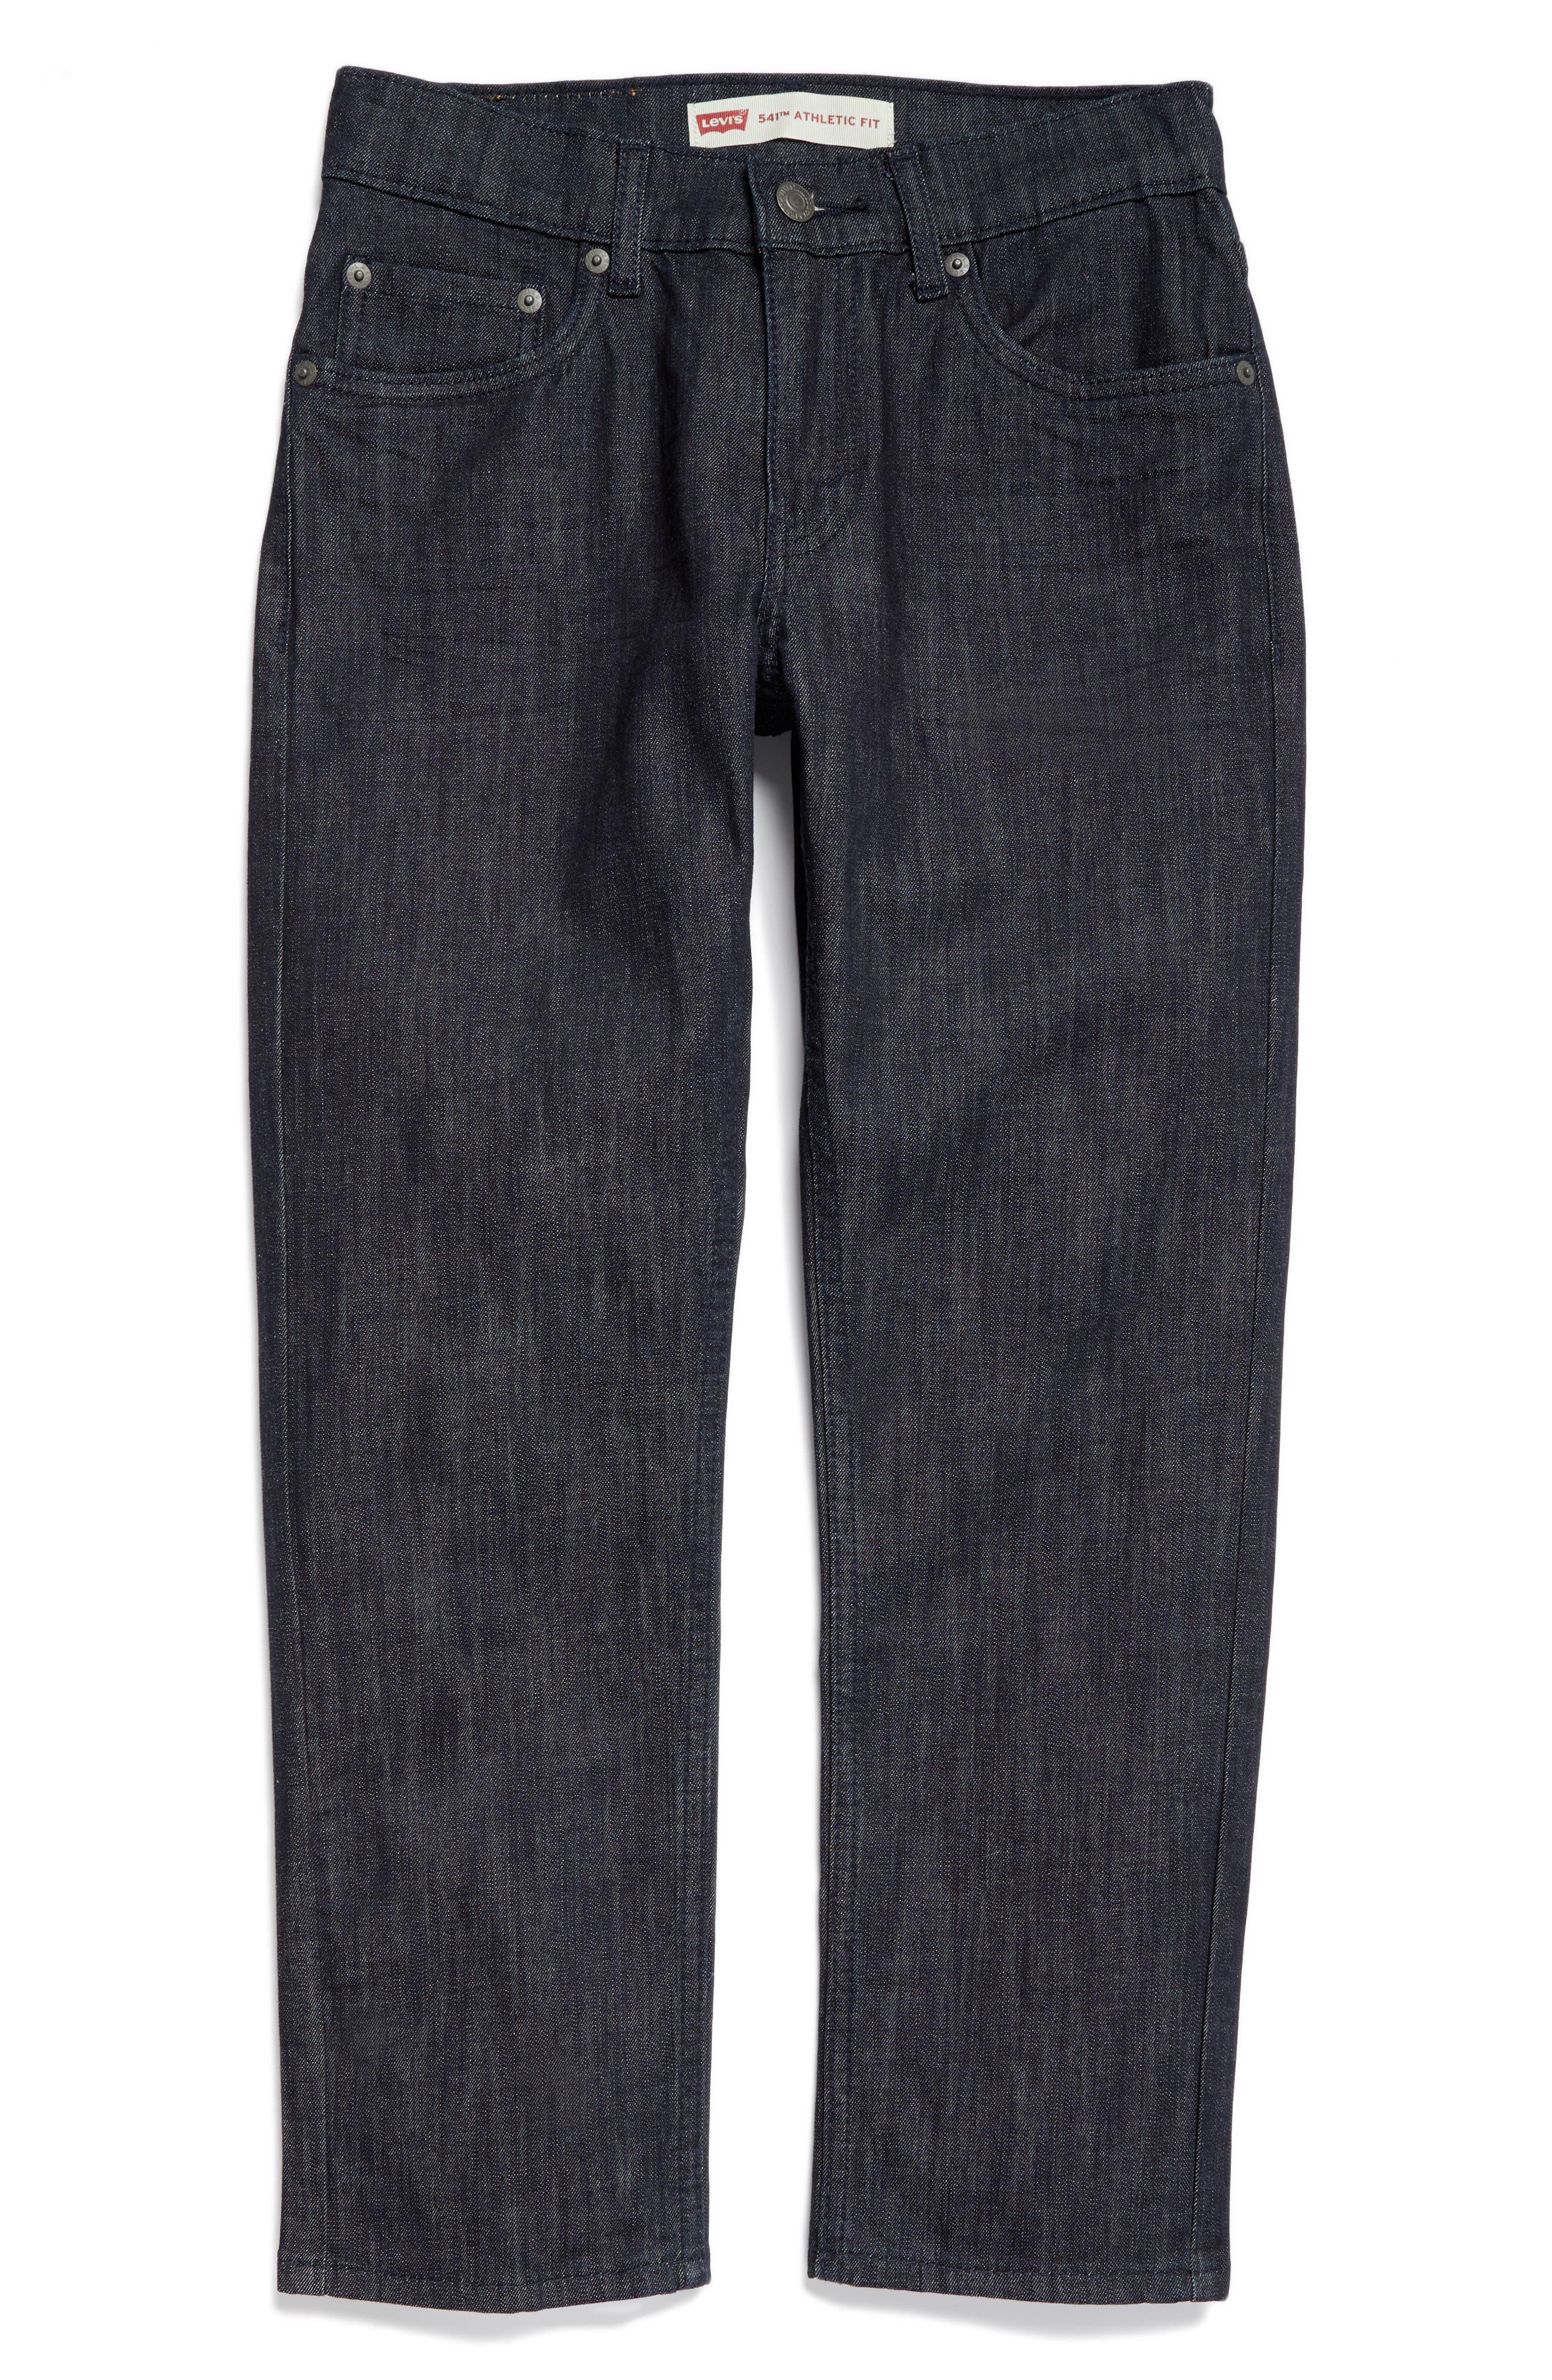 Main Image - Levi's® 541™ Athletic Fit Jeans (Big Boys)